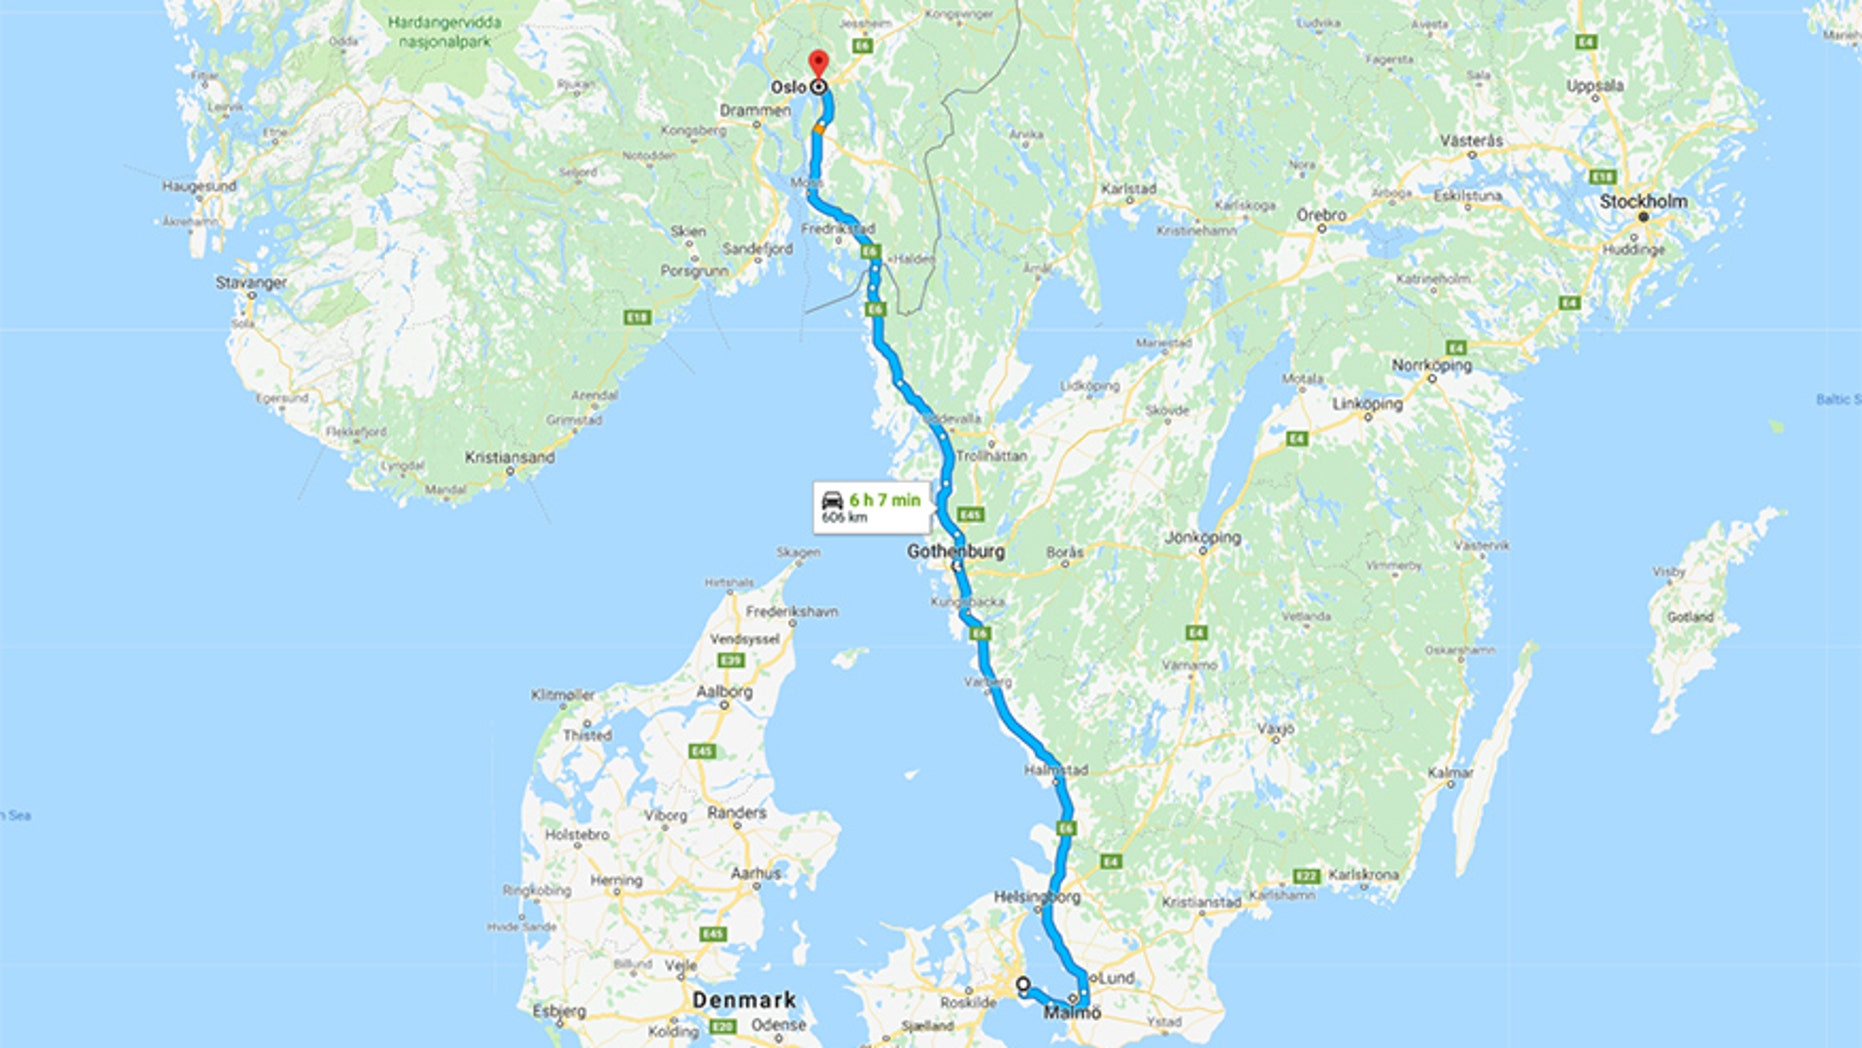 The taxi journey from Copenhagen, Denmark to Oslo, Norway.